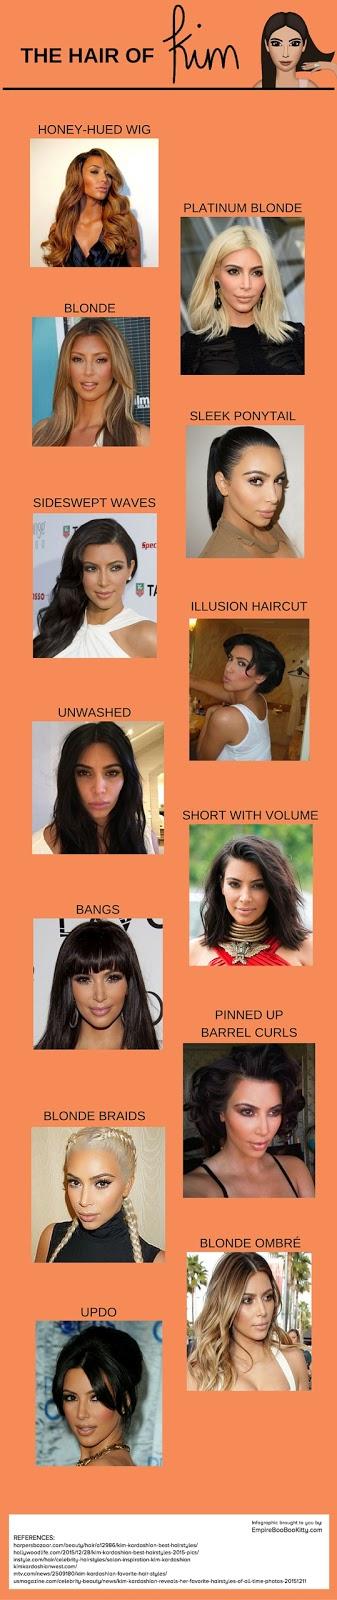 Kim Kardashian Hairstyles Infographic